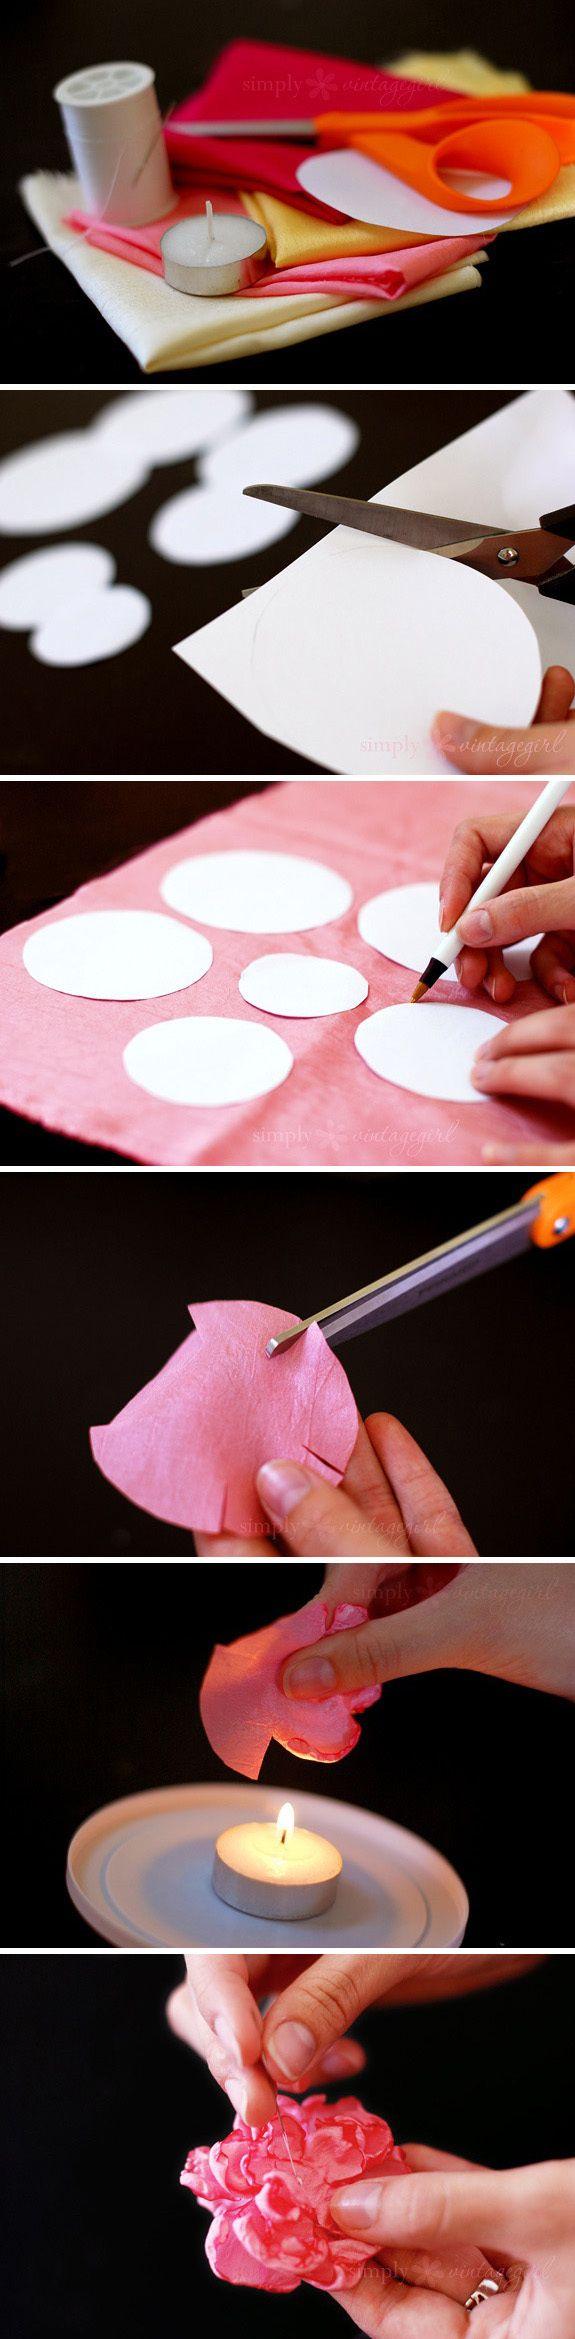 Make it from organza, sateen and shantung fabrics